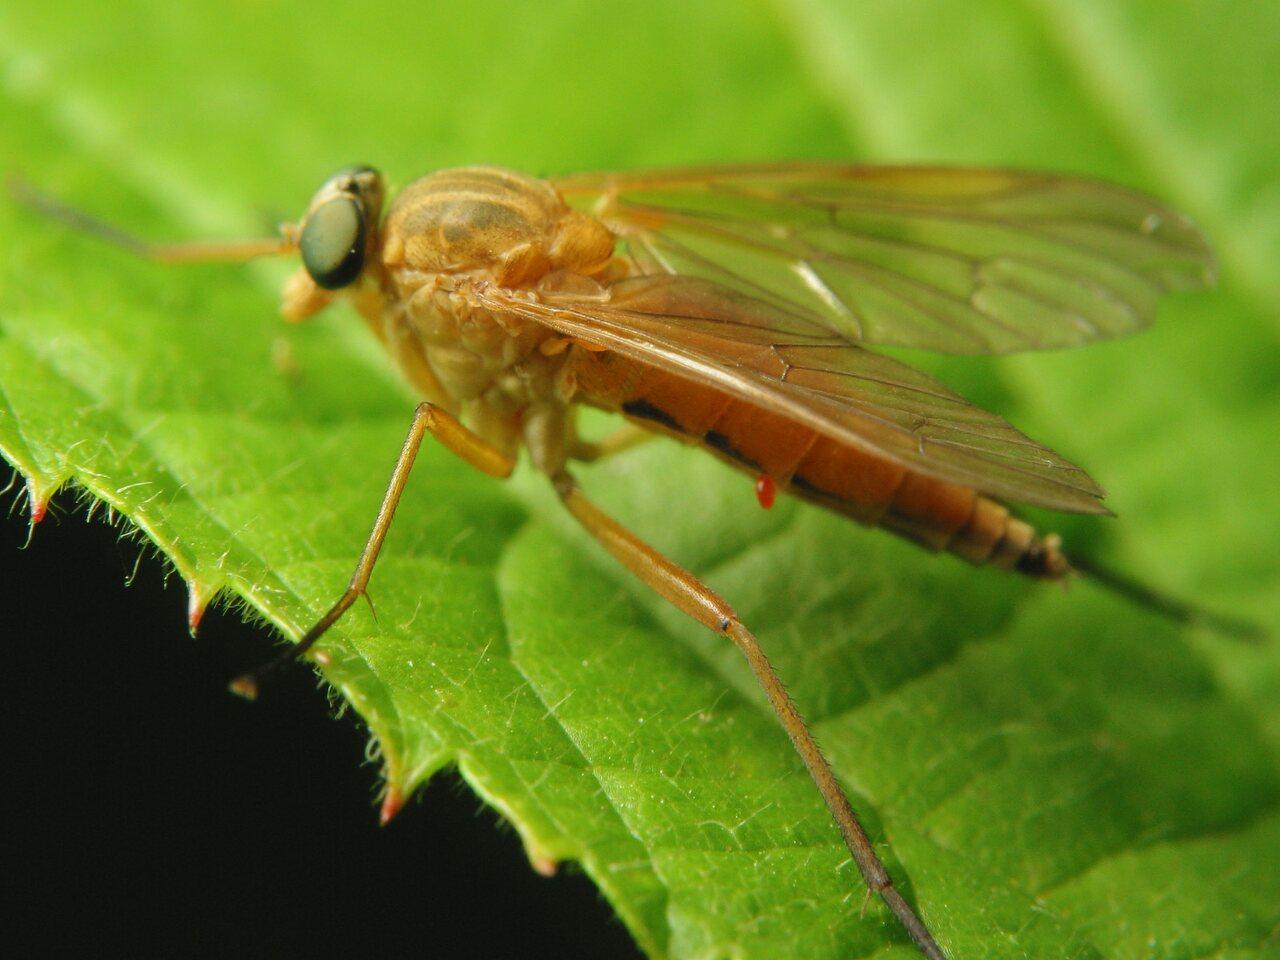 Rhagionidae-3621.jpg